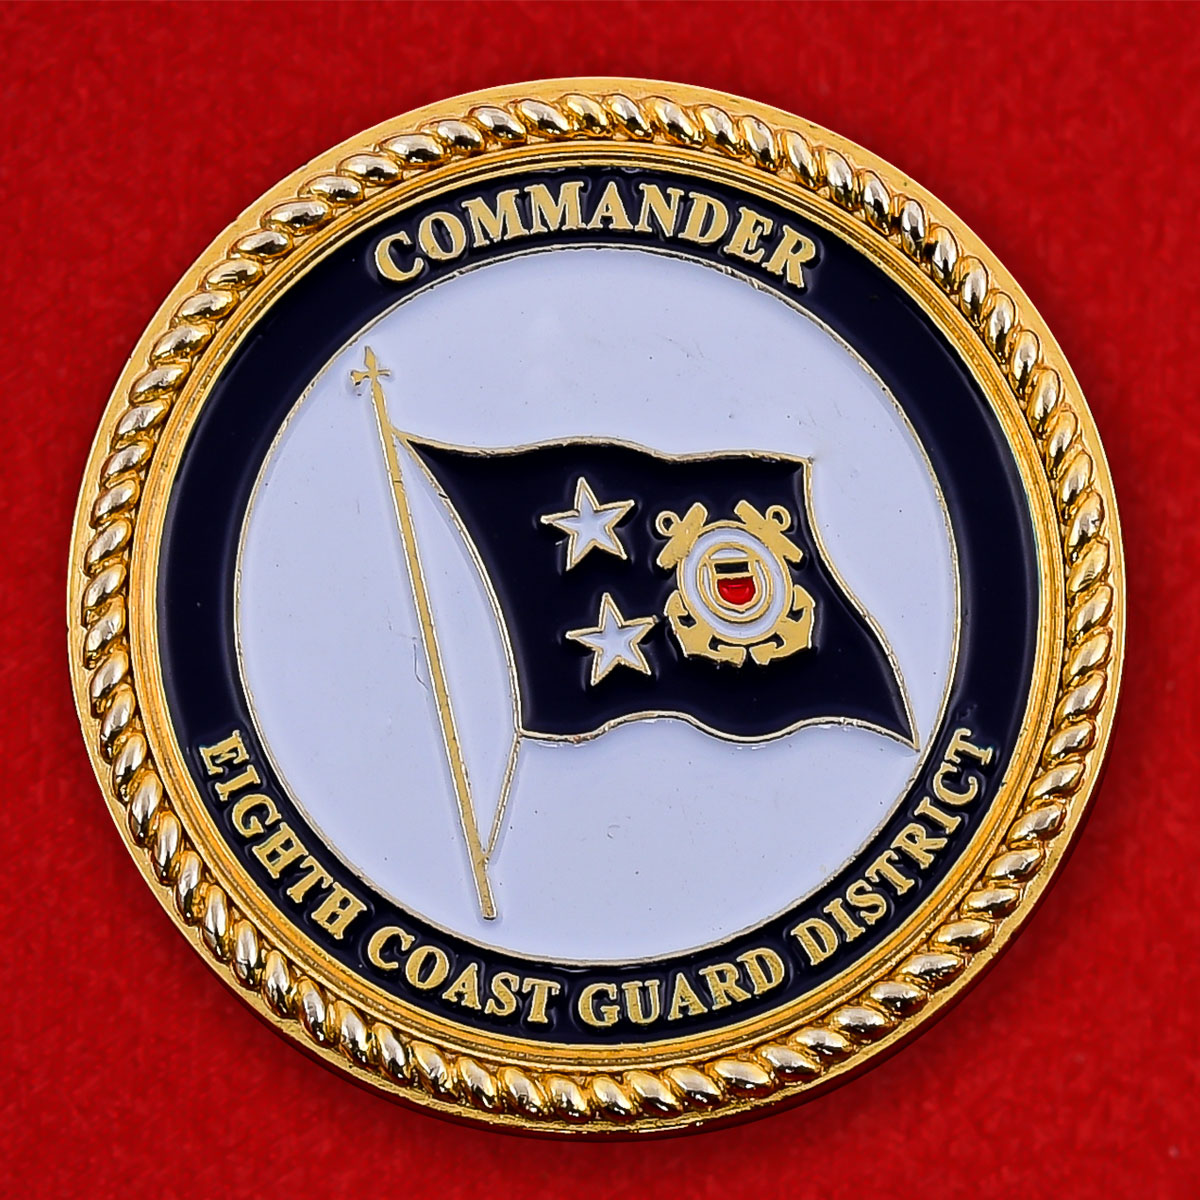 Челлендж коин командира Службы береговой охраны 8-го округа США